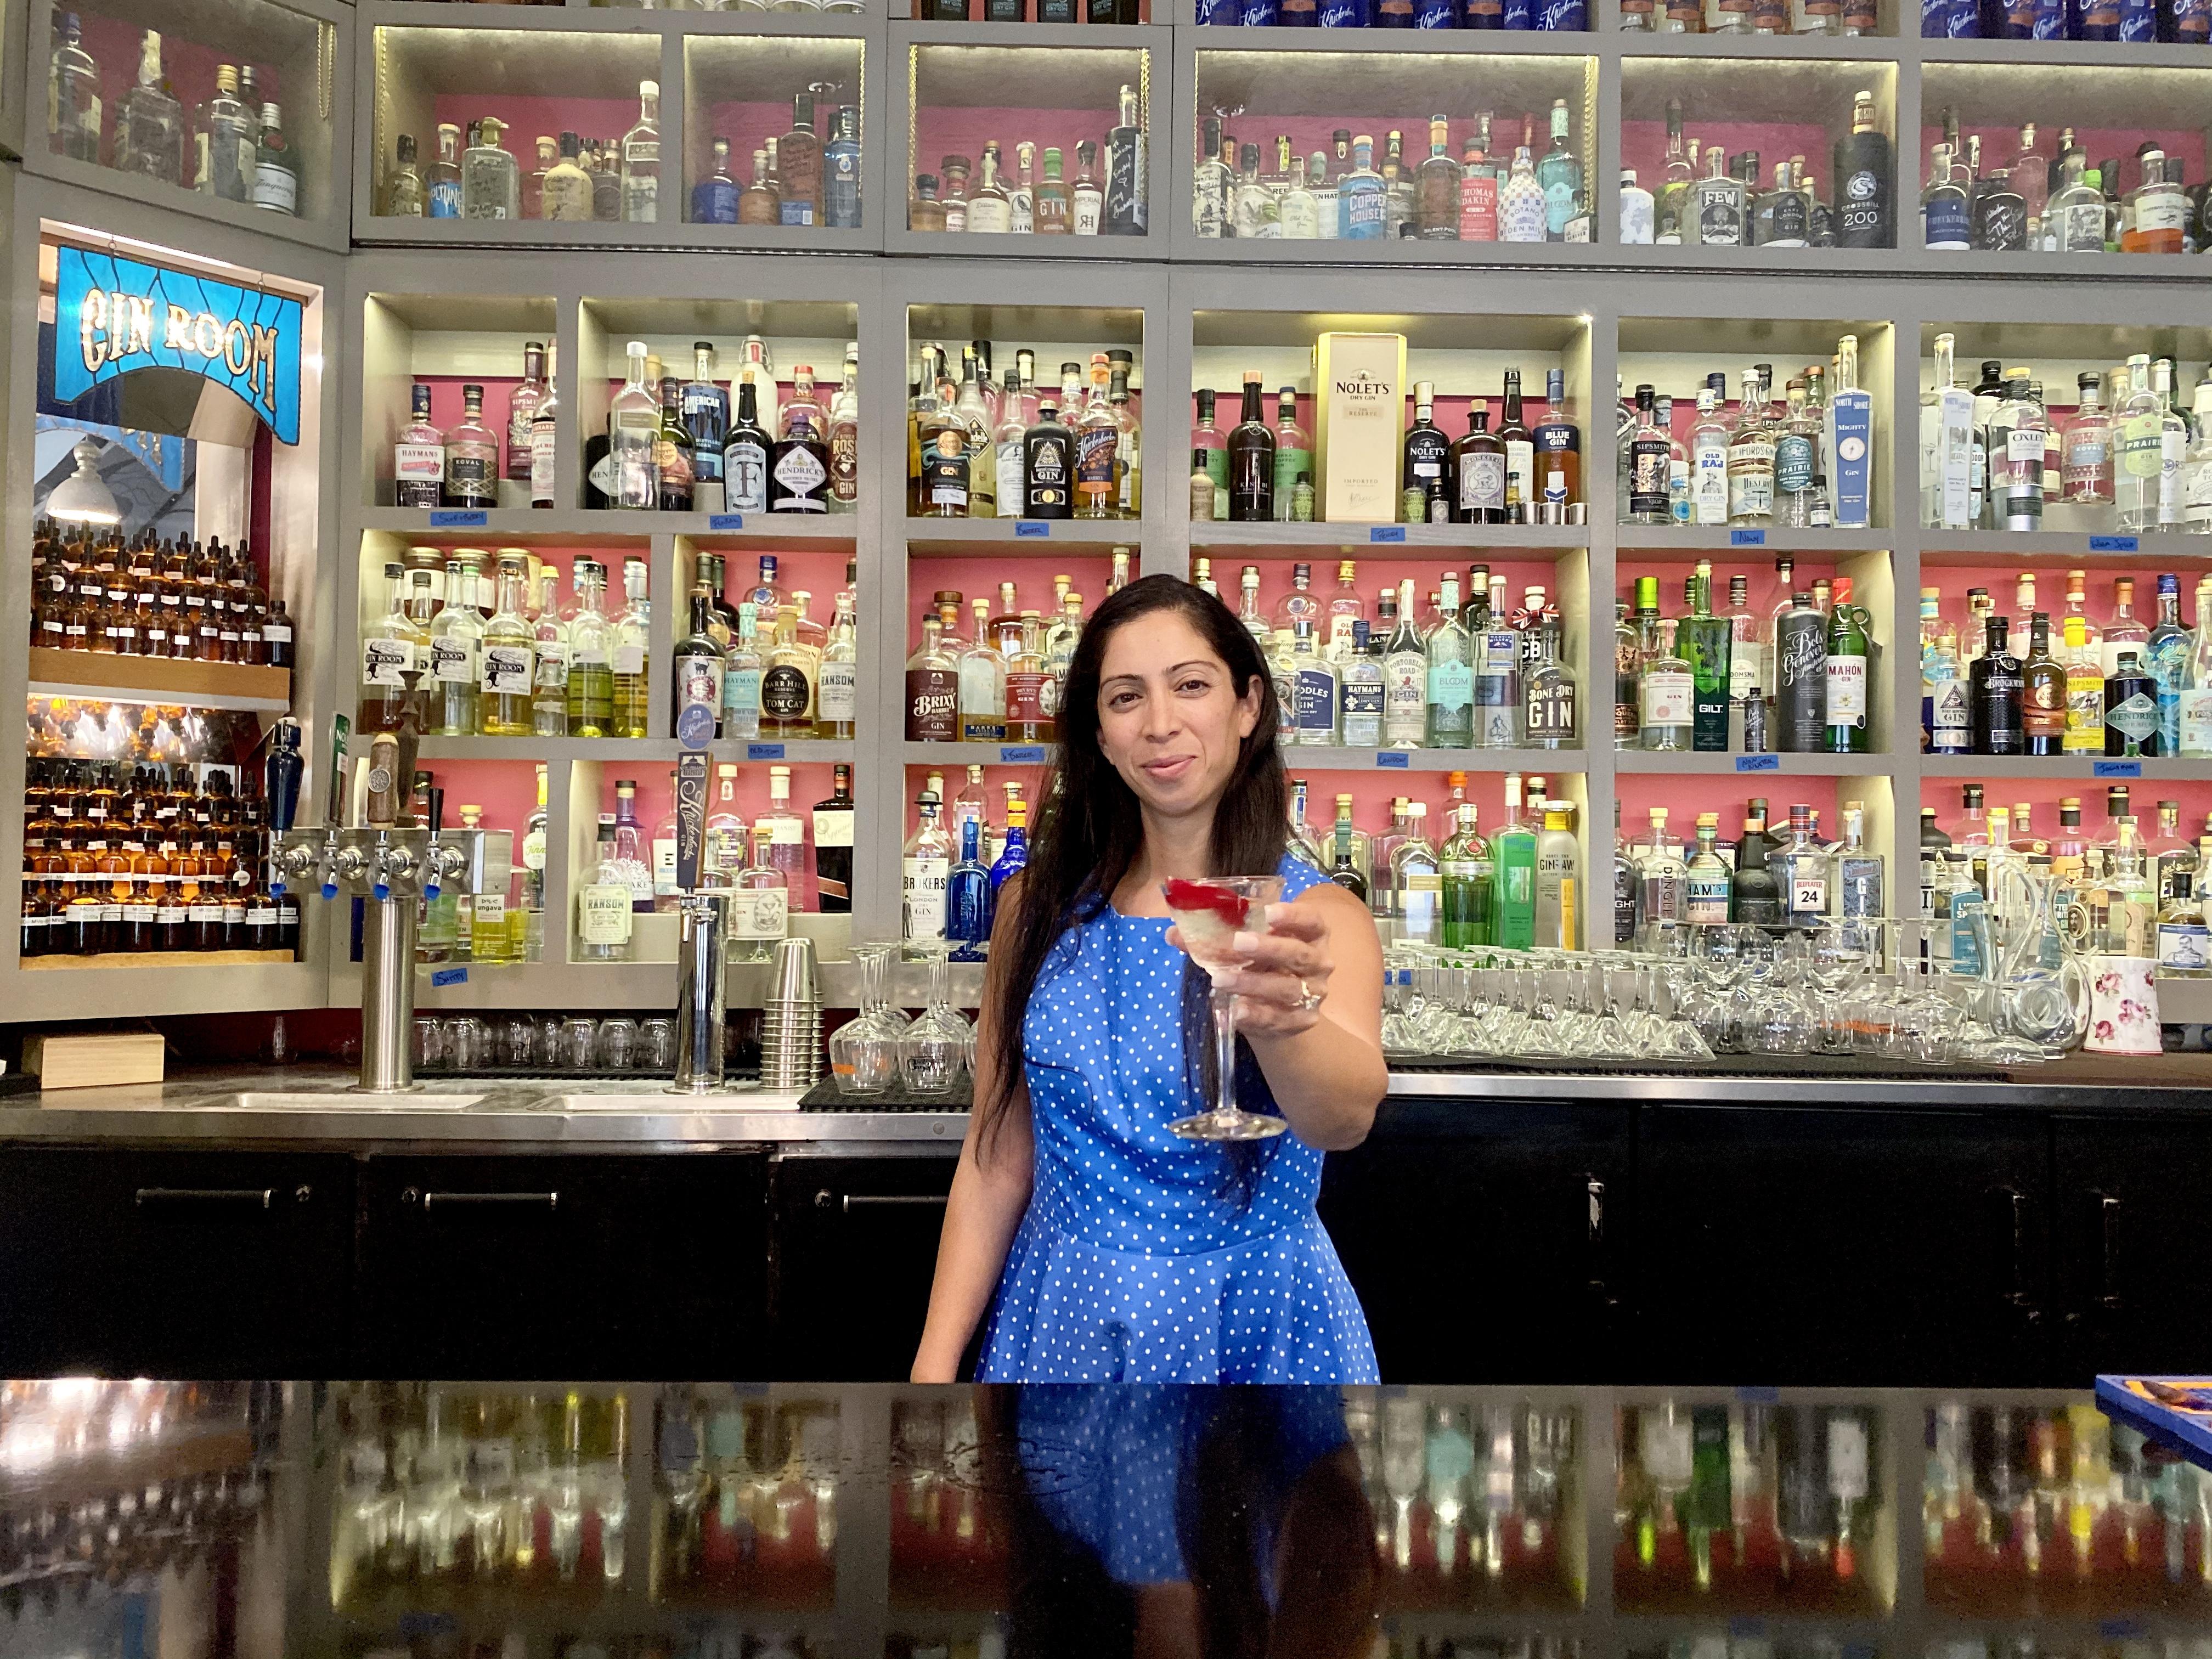 Natasha Bahrani at The Gin Room, St. Louis